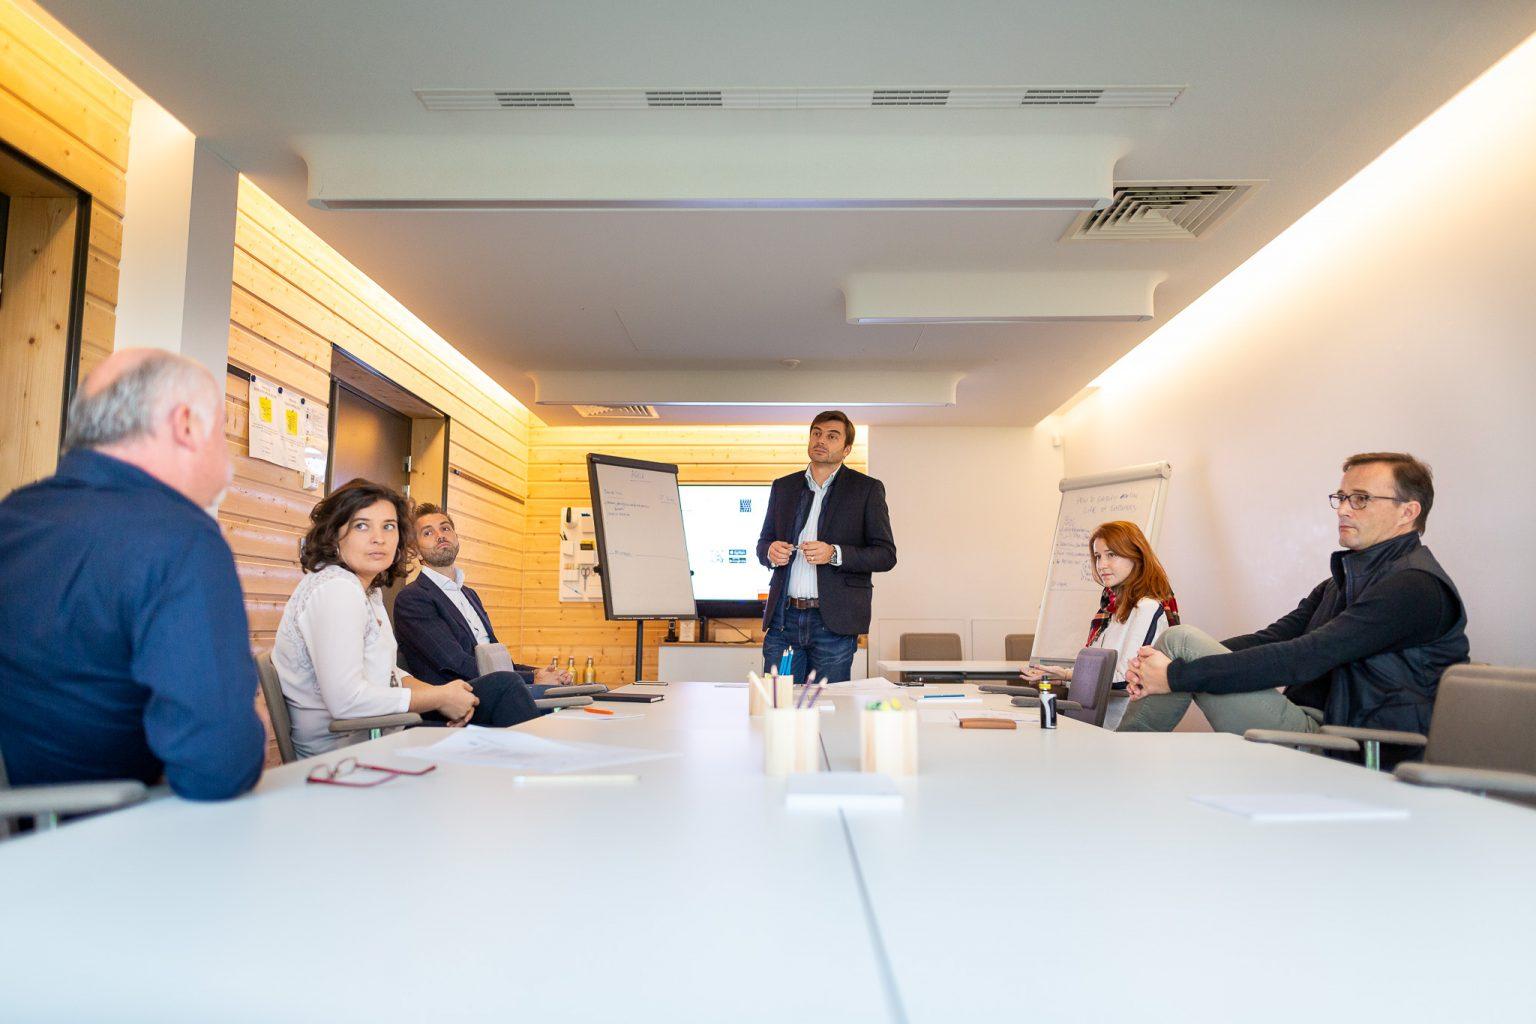 photographe team building corporate paris